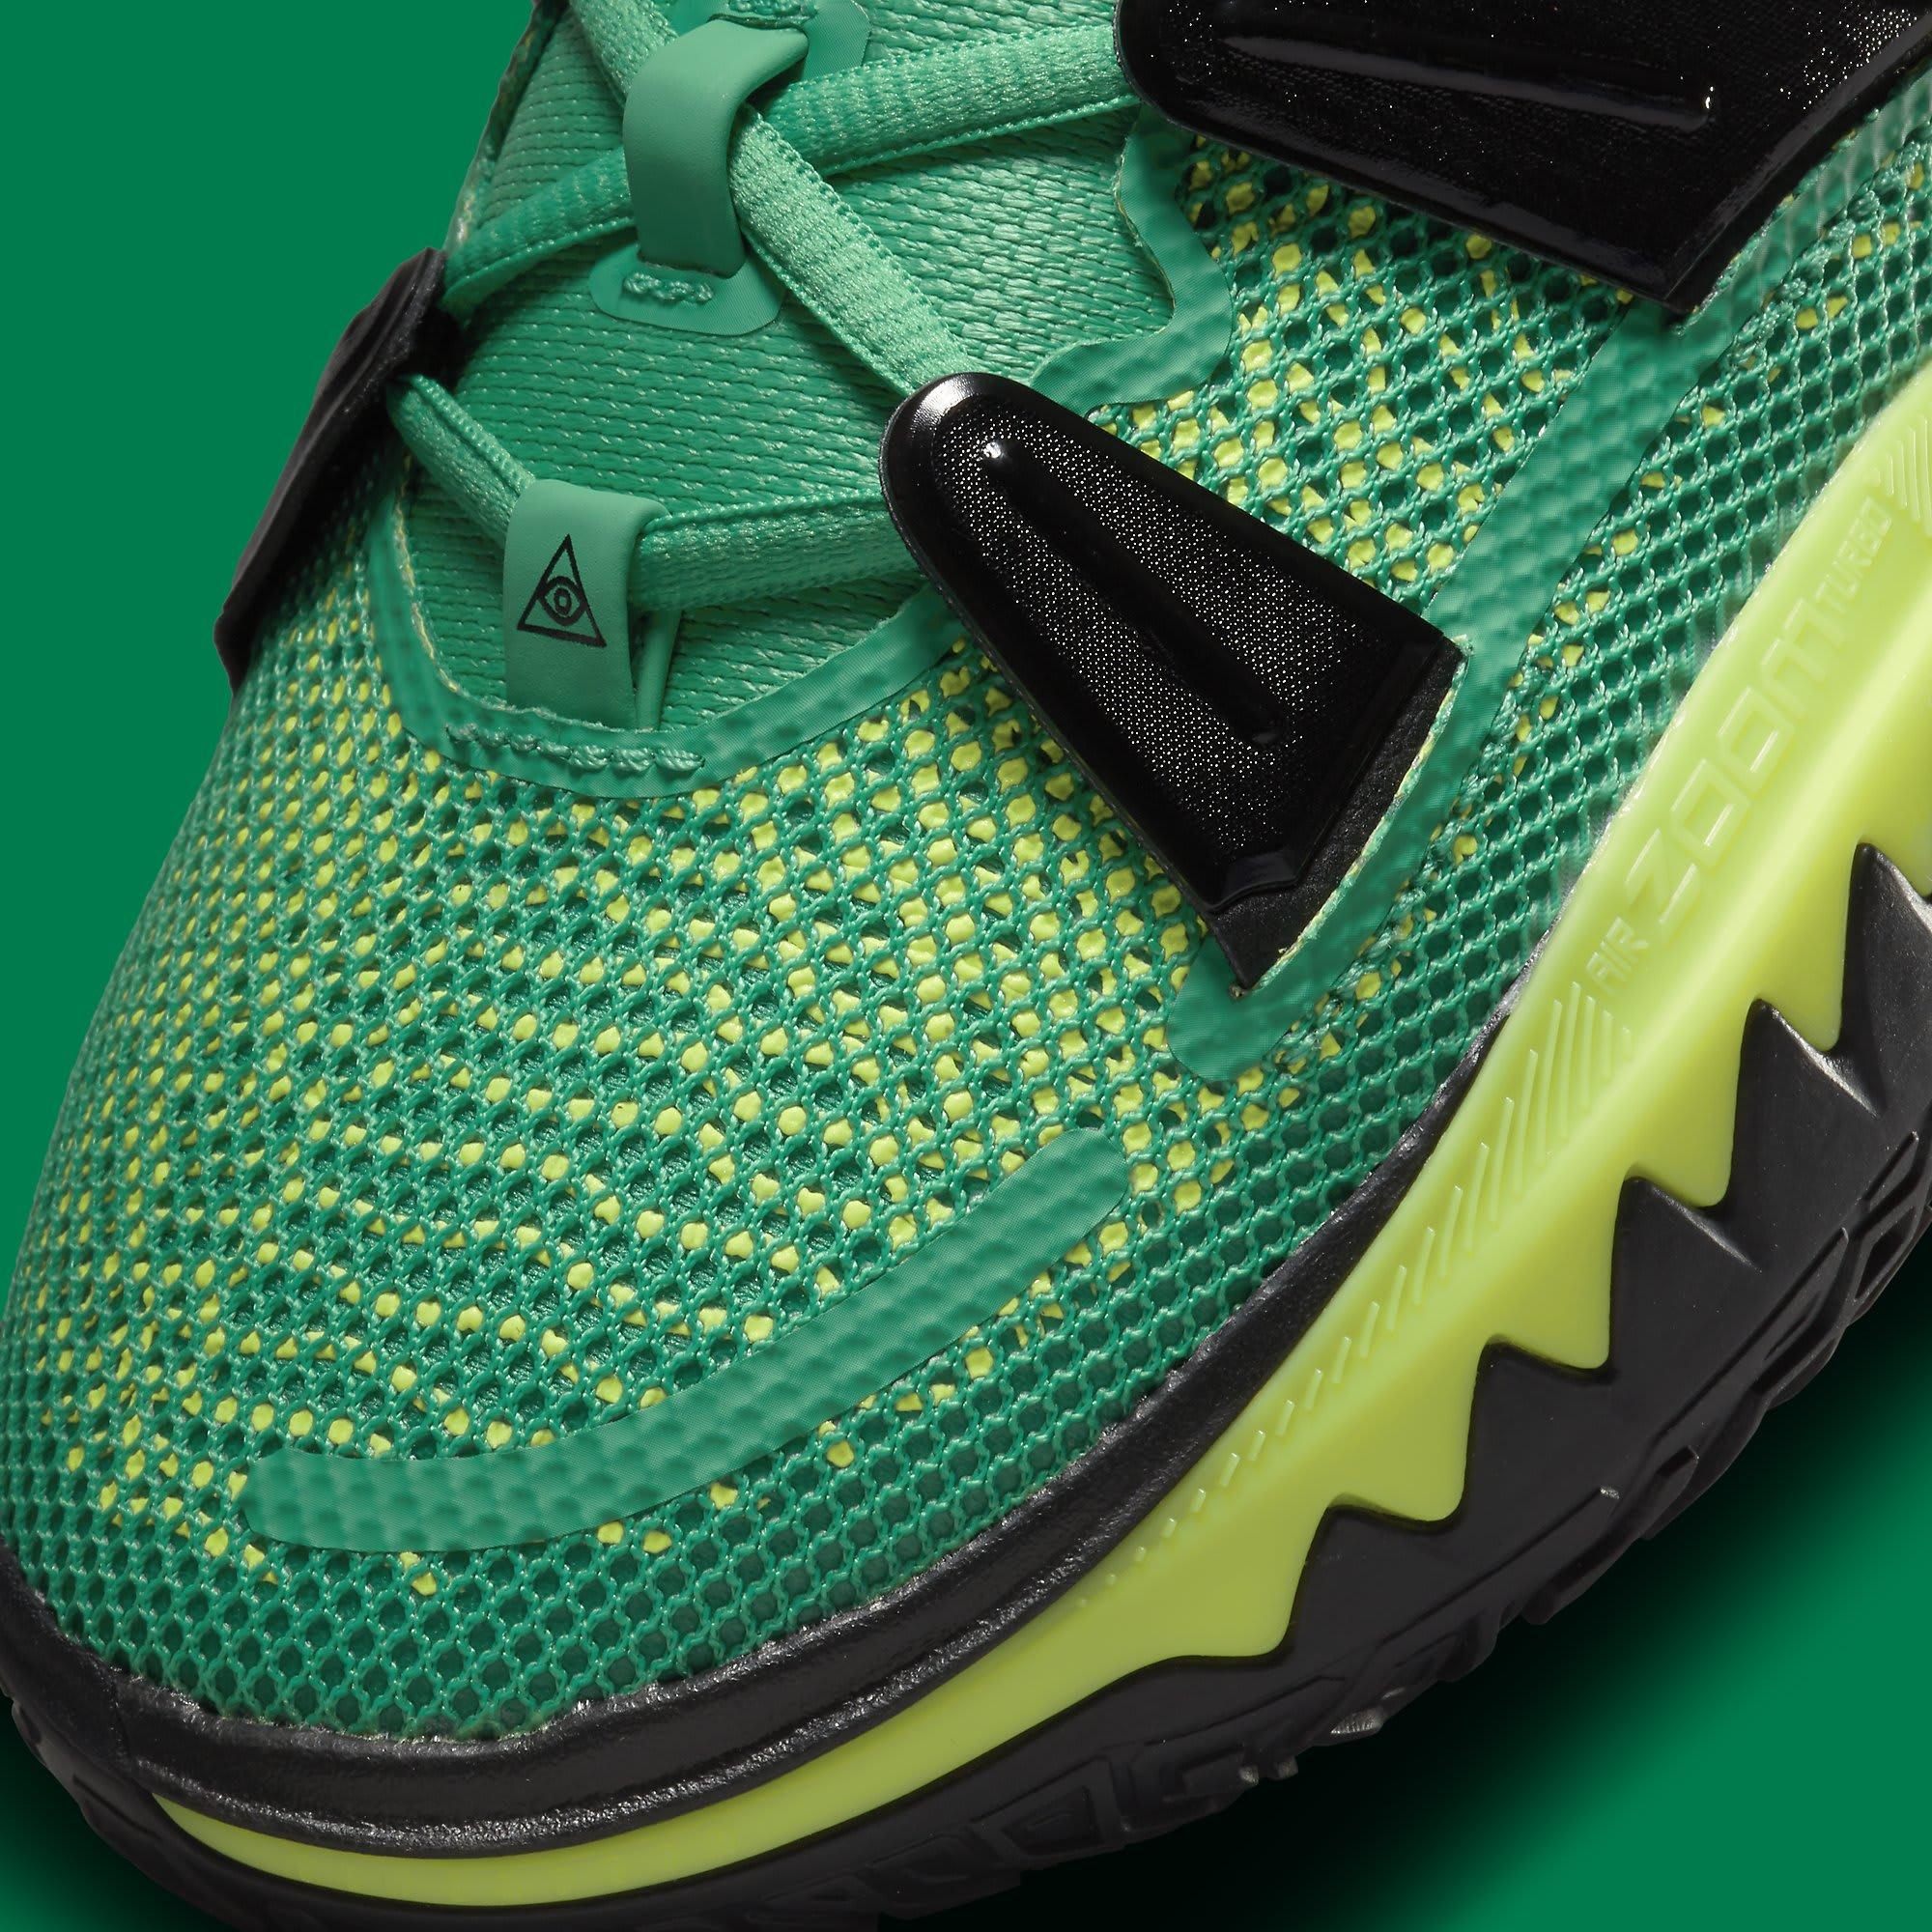 Nike Kyrie 7 'Weatherman' CQ9327-300 Toe